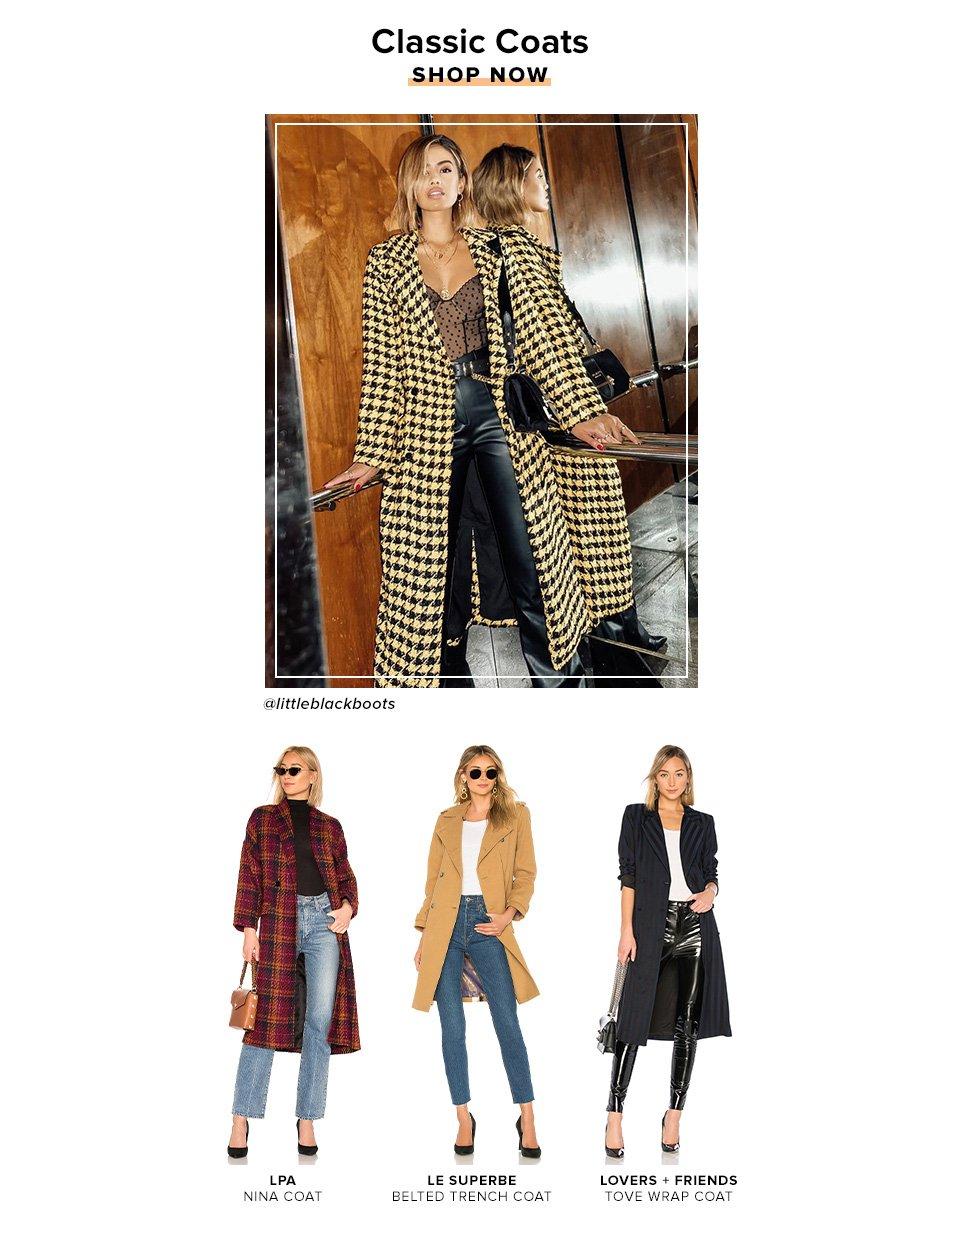 Classic Coats. Shop Now.